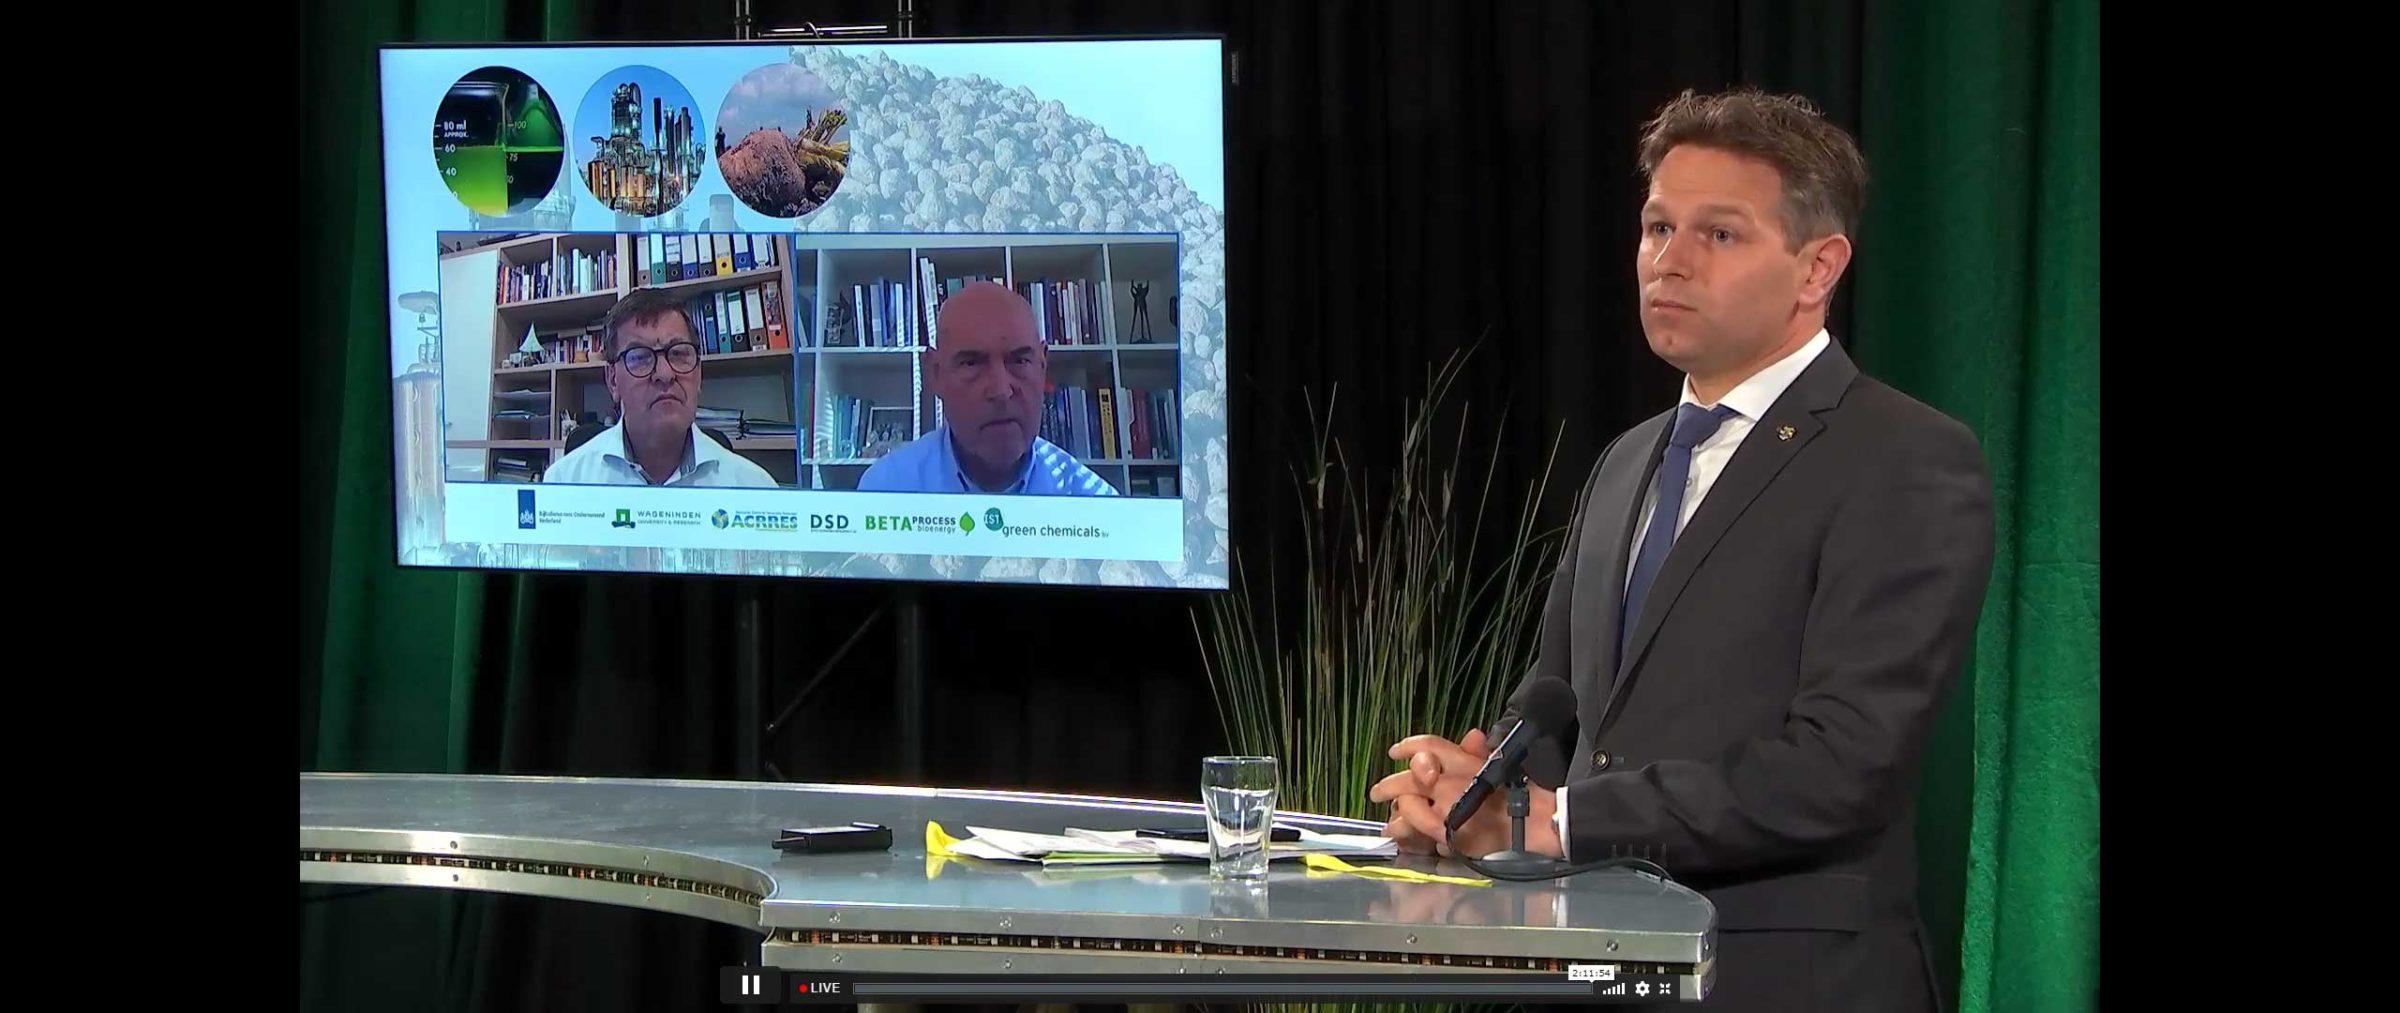 Jo-Annes de Bat in front of the screen showing Franc Bogovic (l) and Herman Wijffels (r)